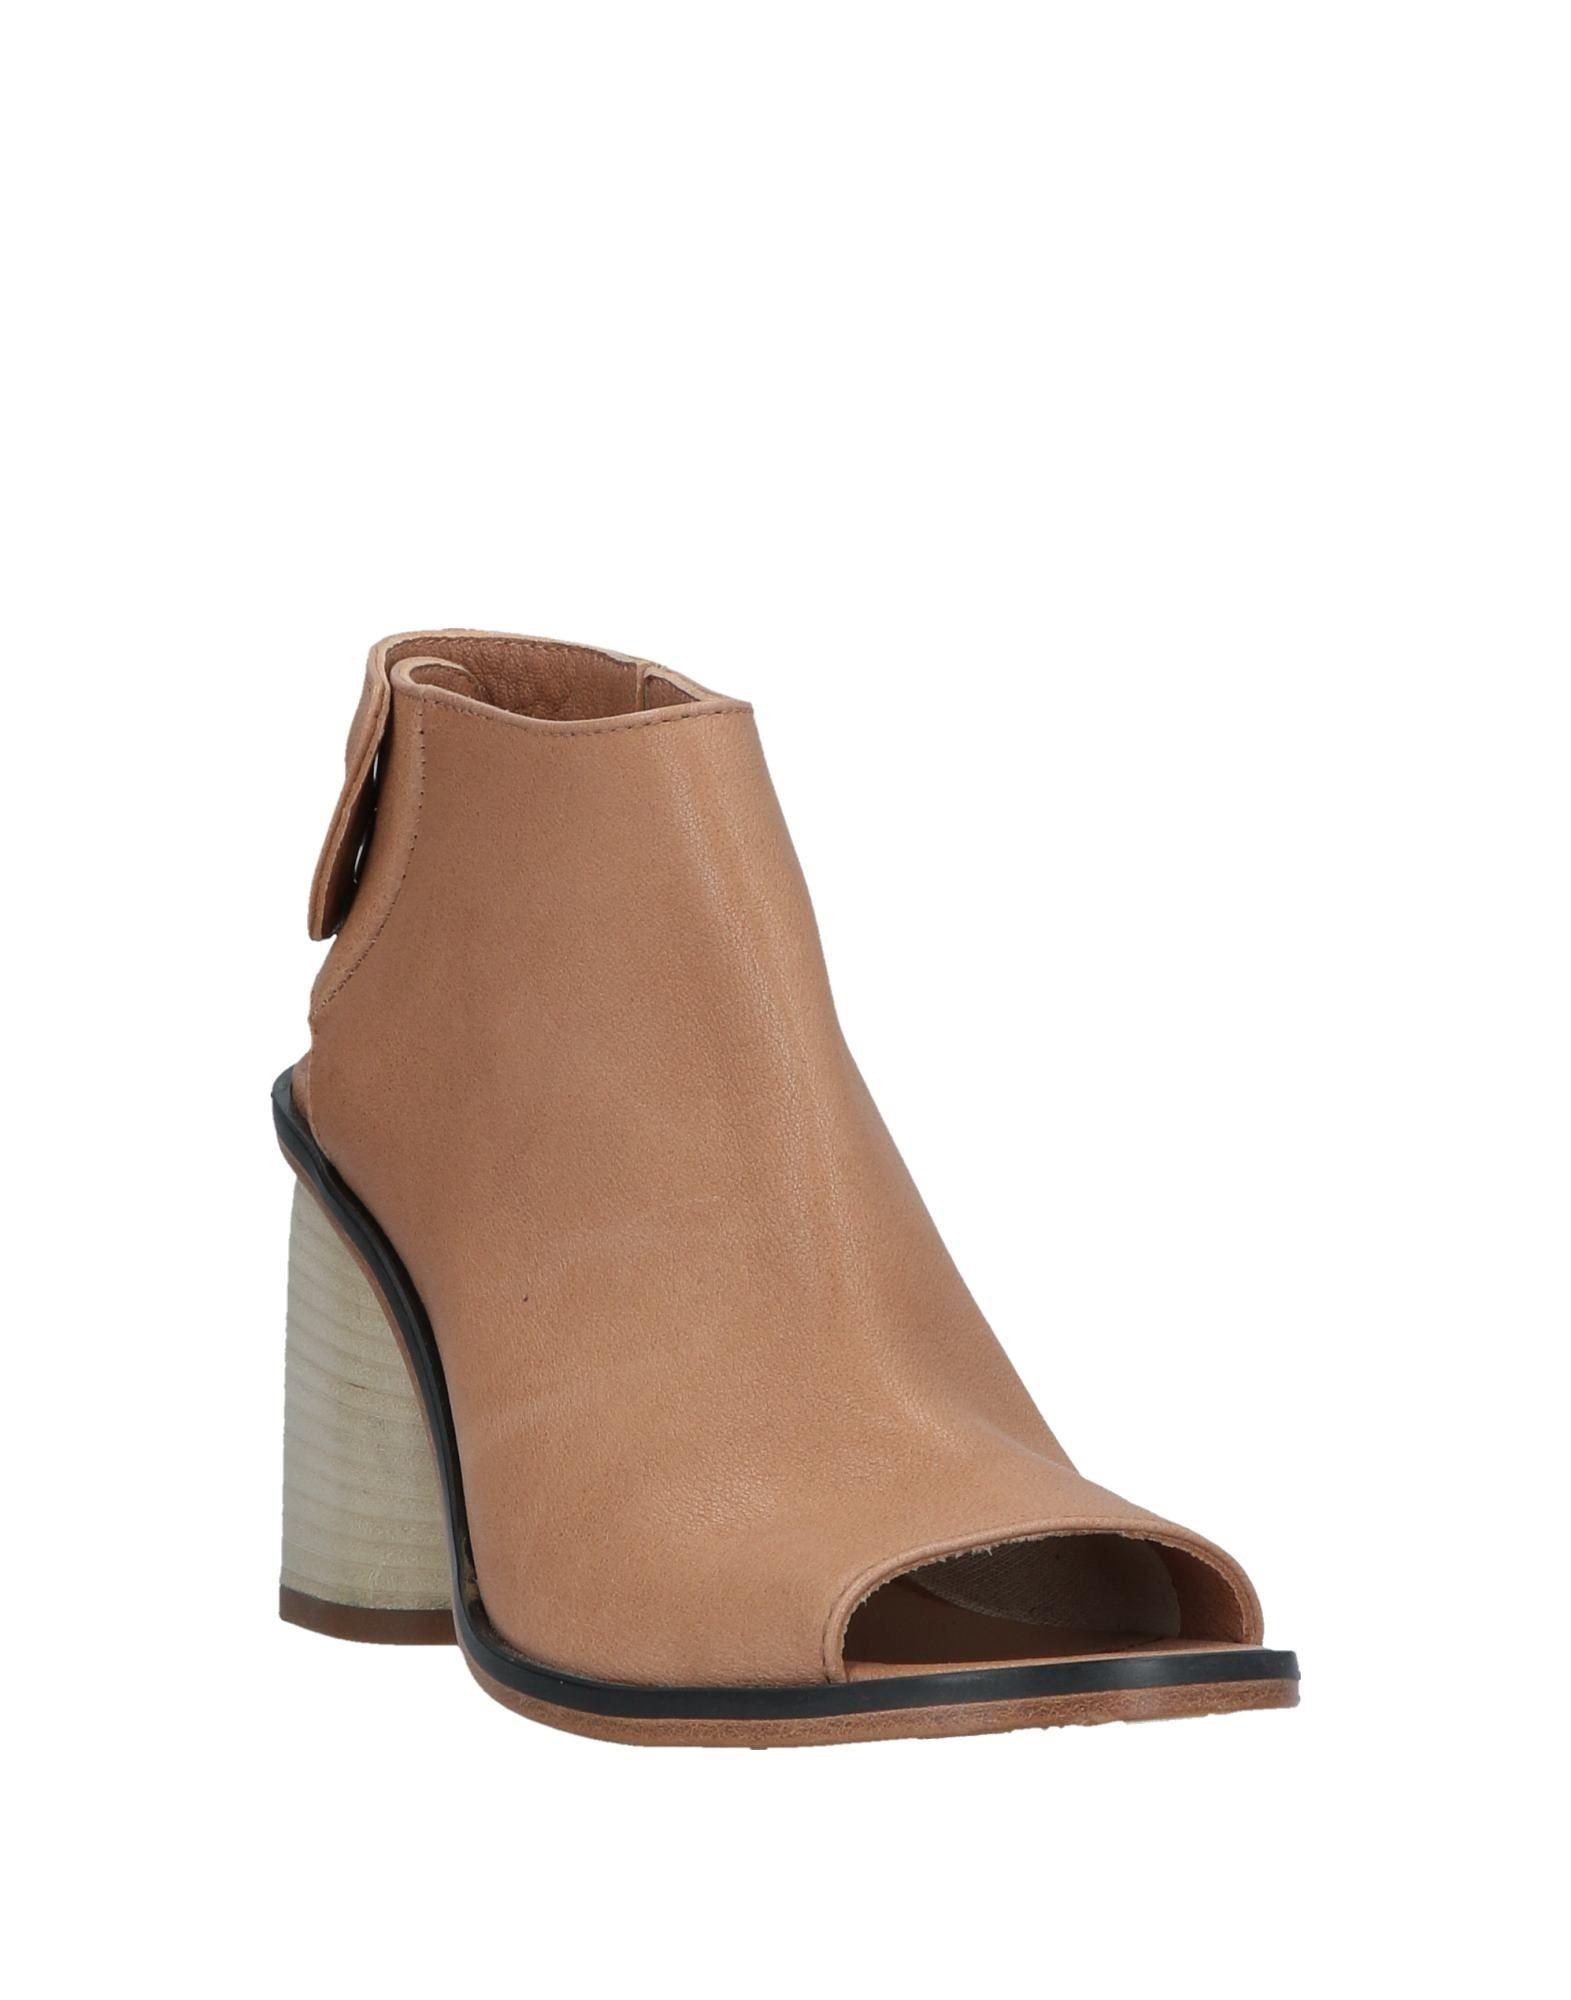 Lemaré Sandalen Damen  11604063LV Gute Qualität beliebte beliebte beliebte Schuhe bc2575